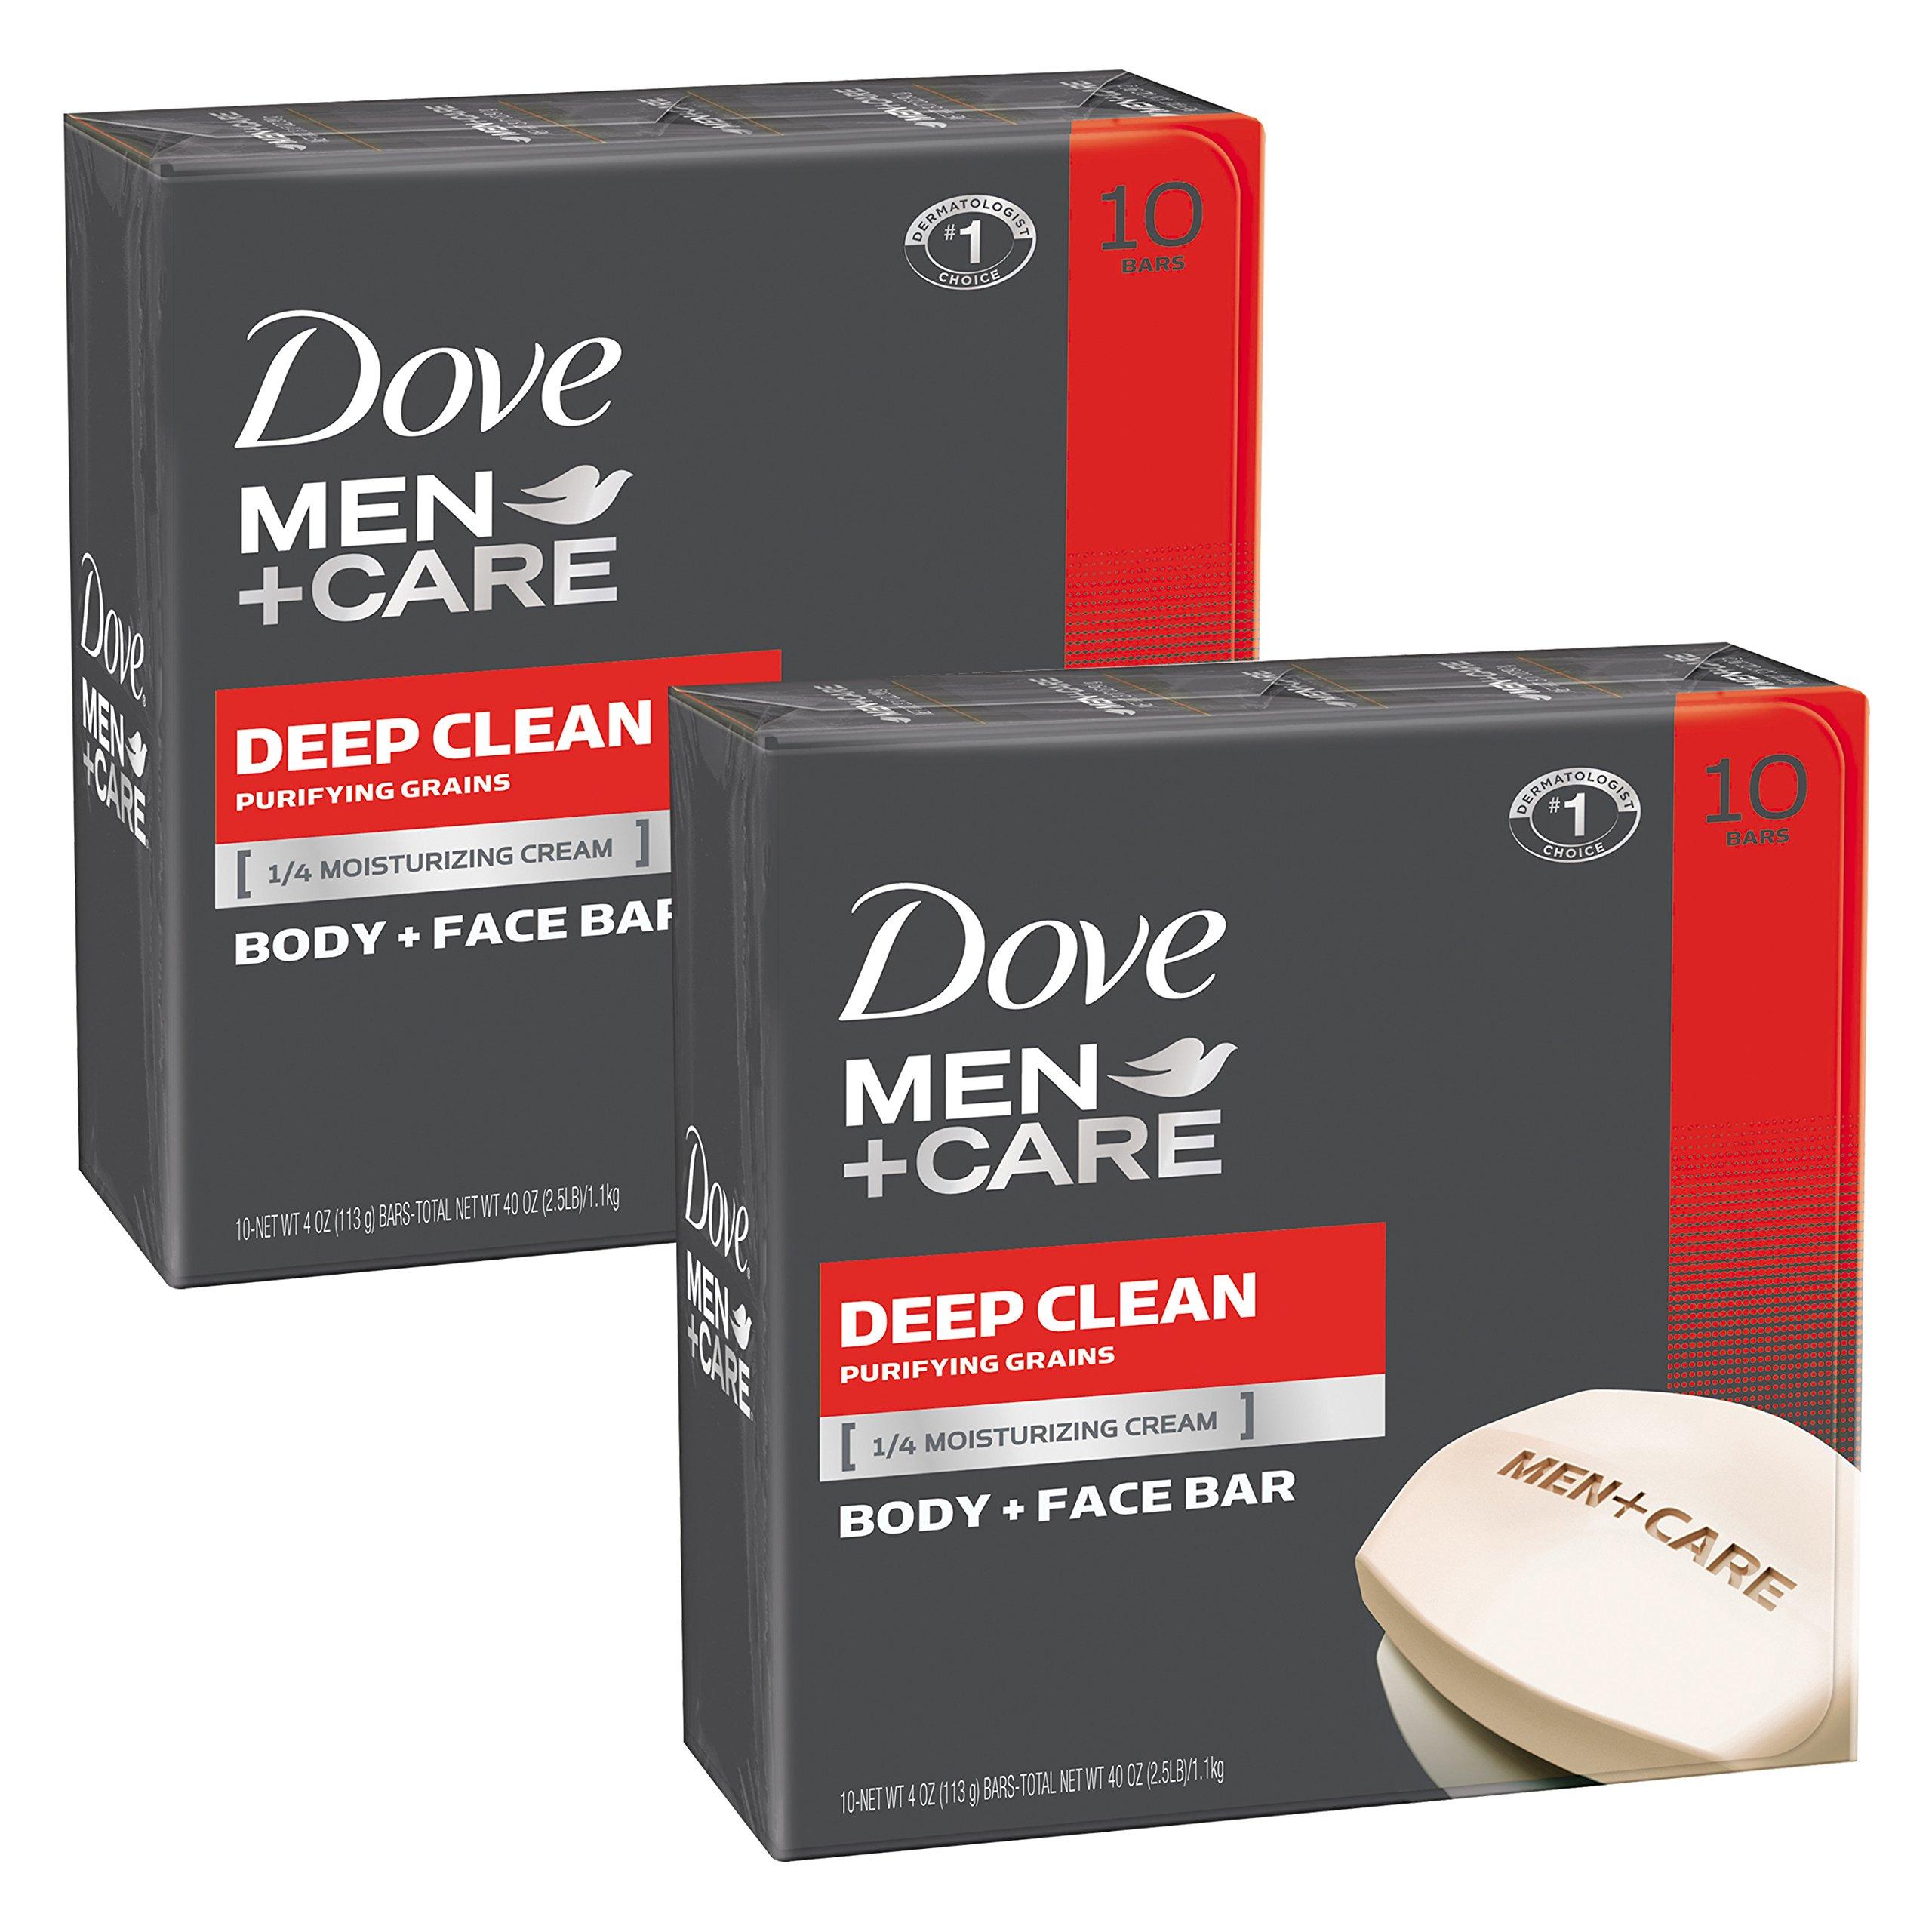 Dove Men+Care Body and Face Bar, Deep Clean, 4 Ounce, 20 Bar